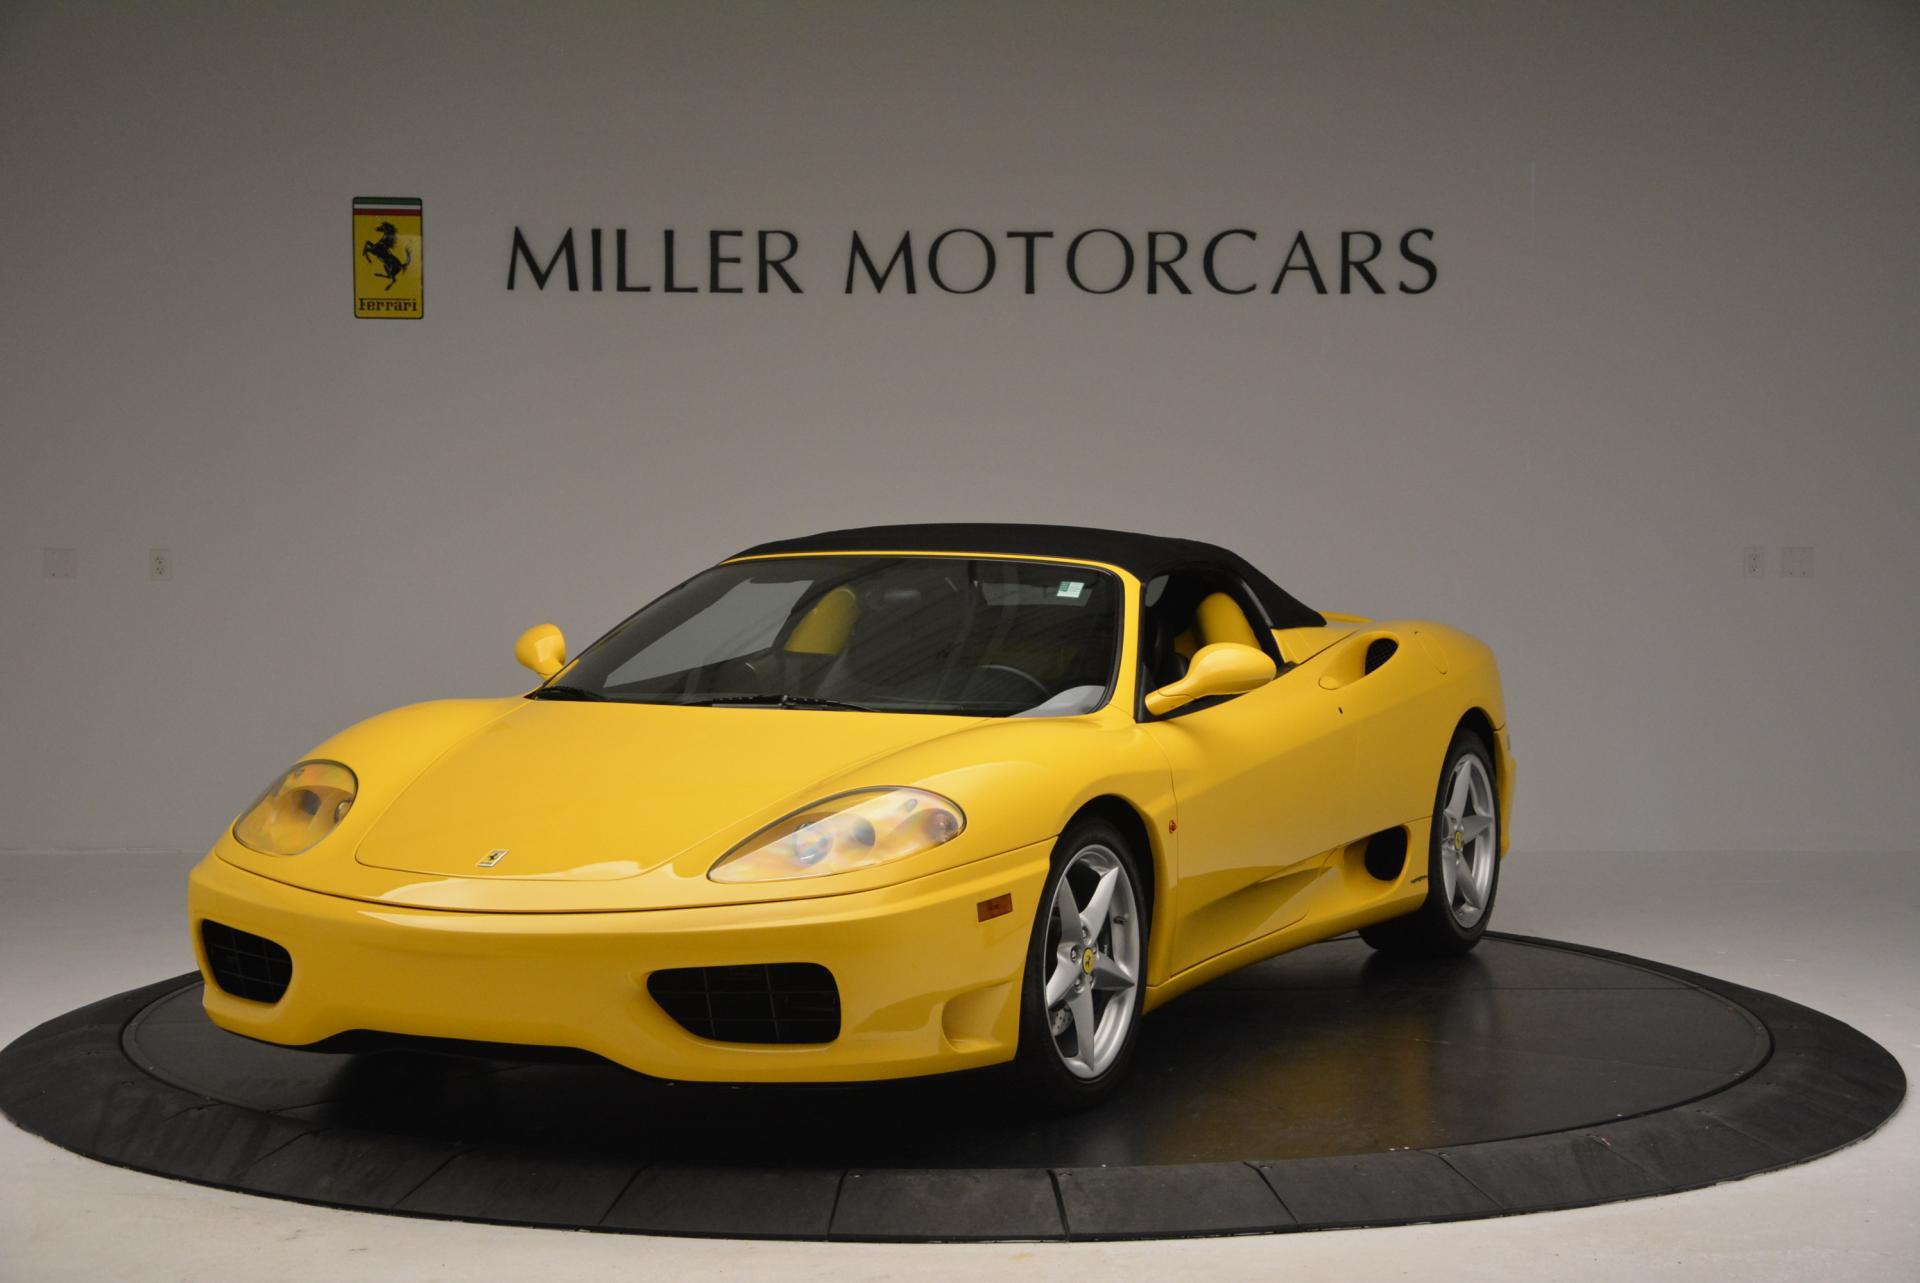 Used 2003 Ferrari 360 Spider 6-Speed Manual  For Sale In Westport, CT 127_p13